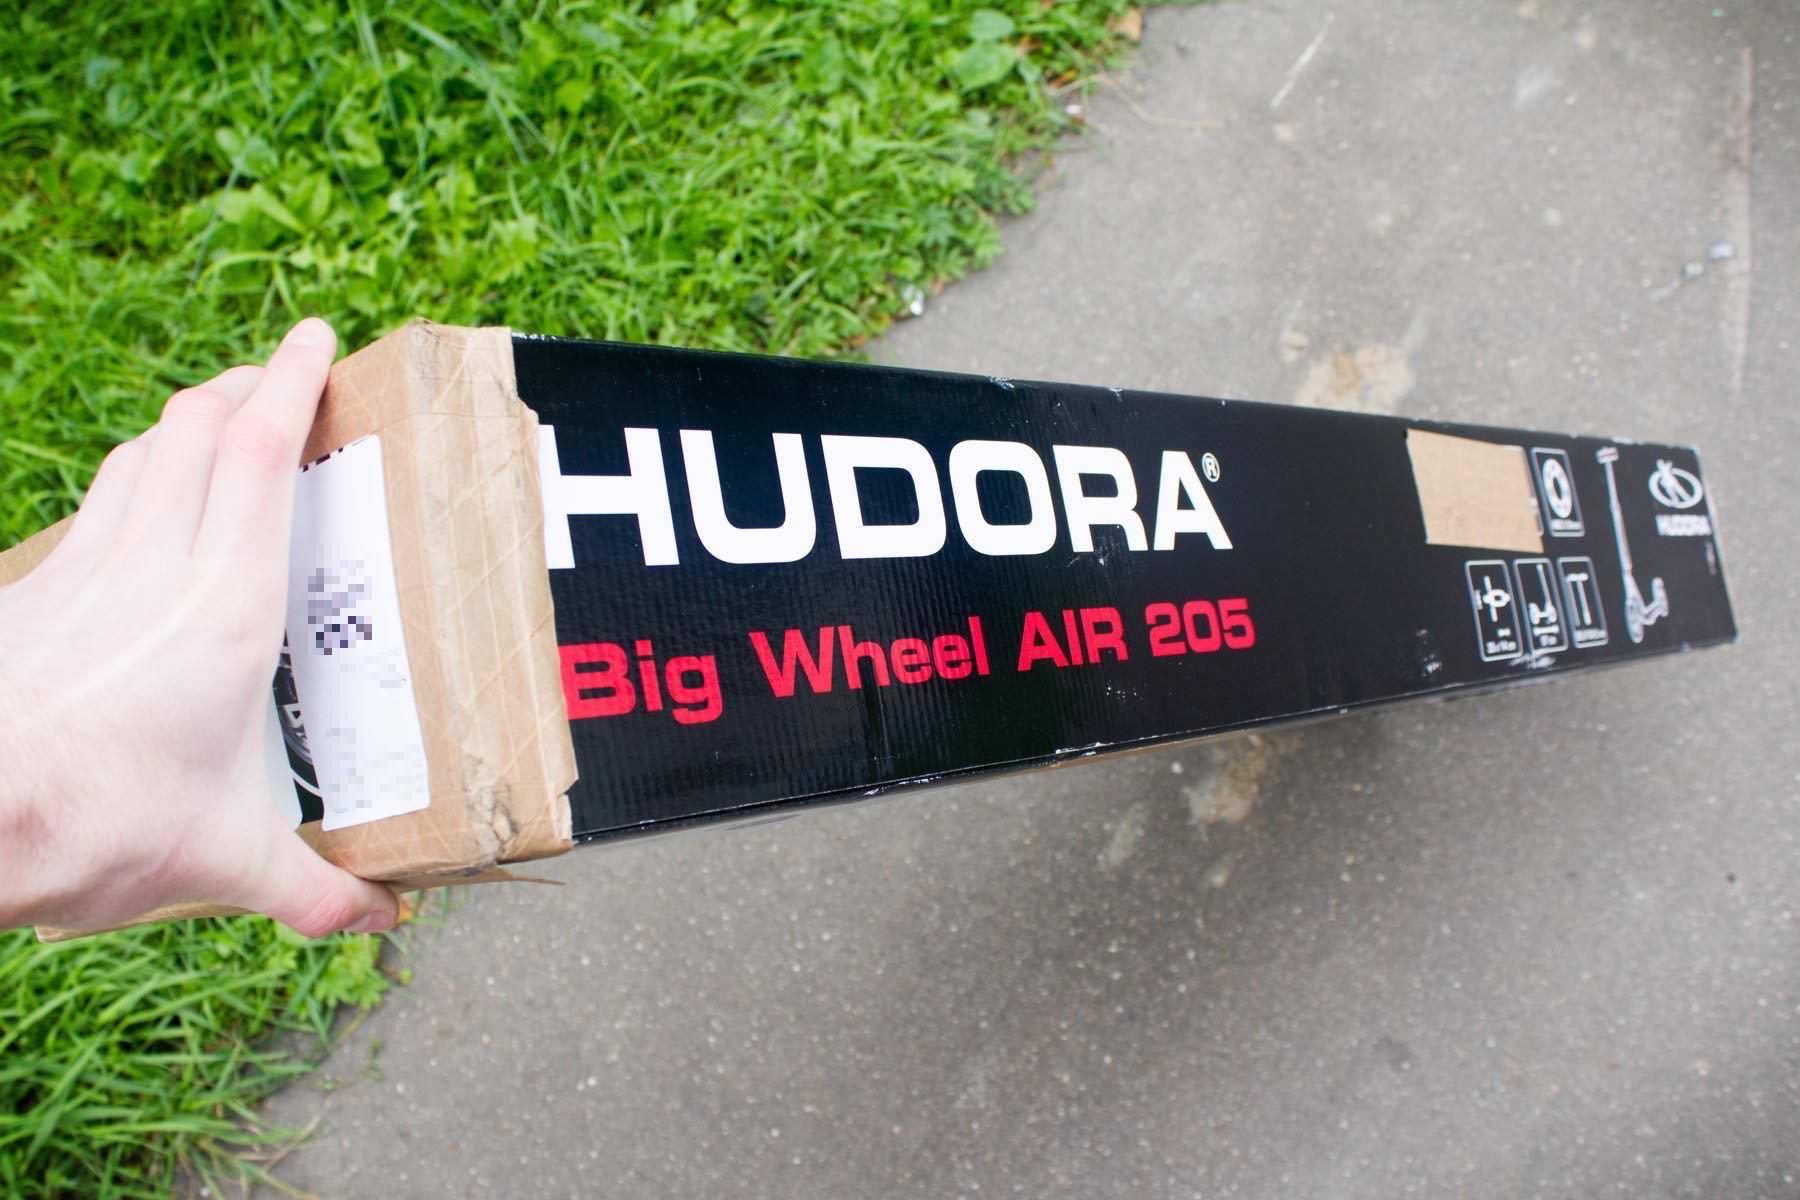 Hudora Big Wheel Air 205 Russia Review 00